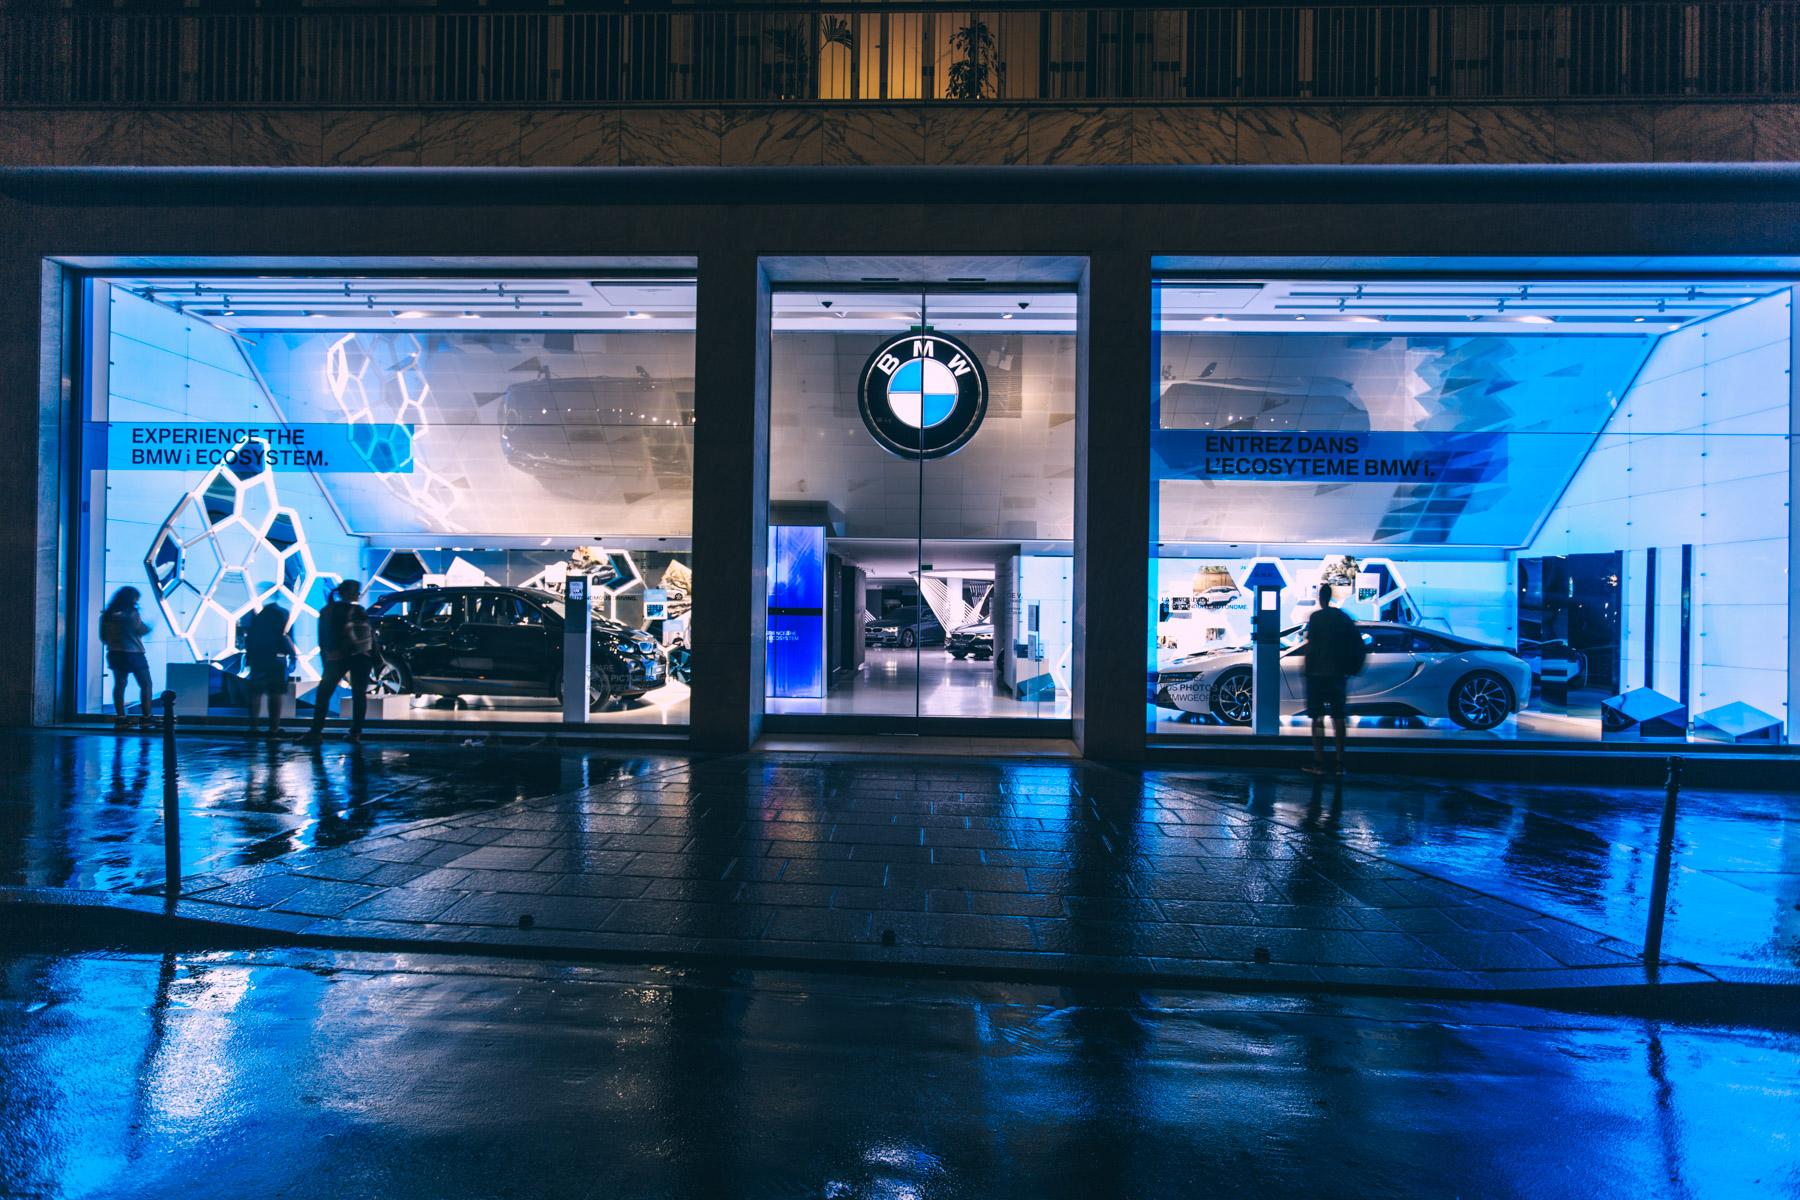 BMW George V EXPERIENCE BMW i ECOSYSYTEM WP2